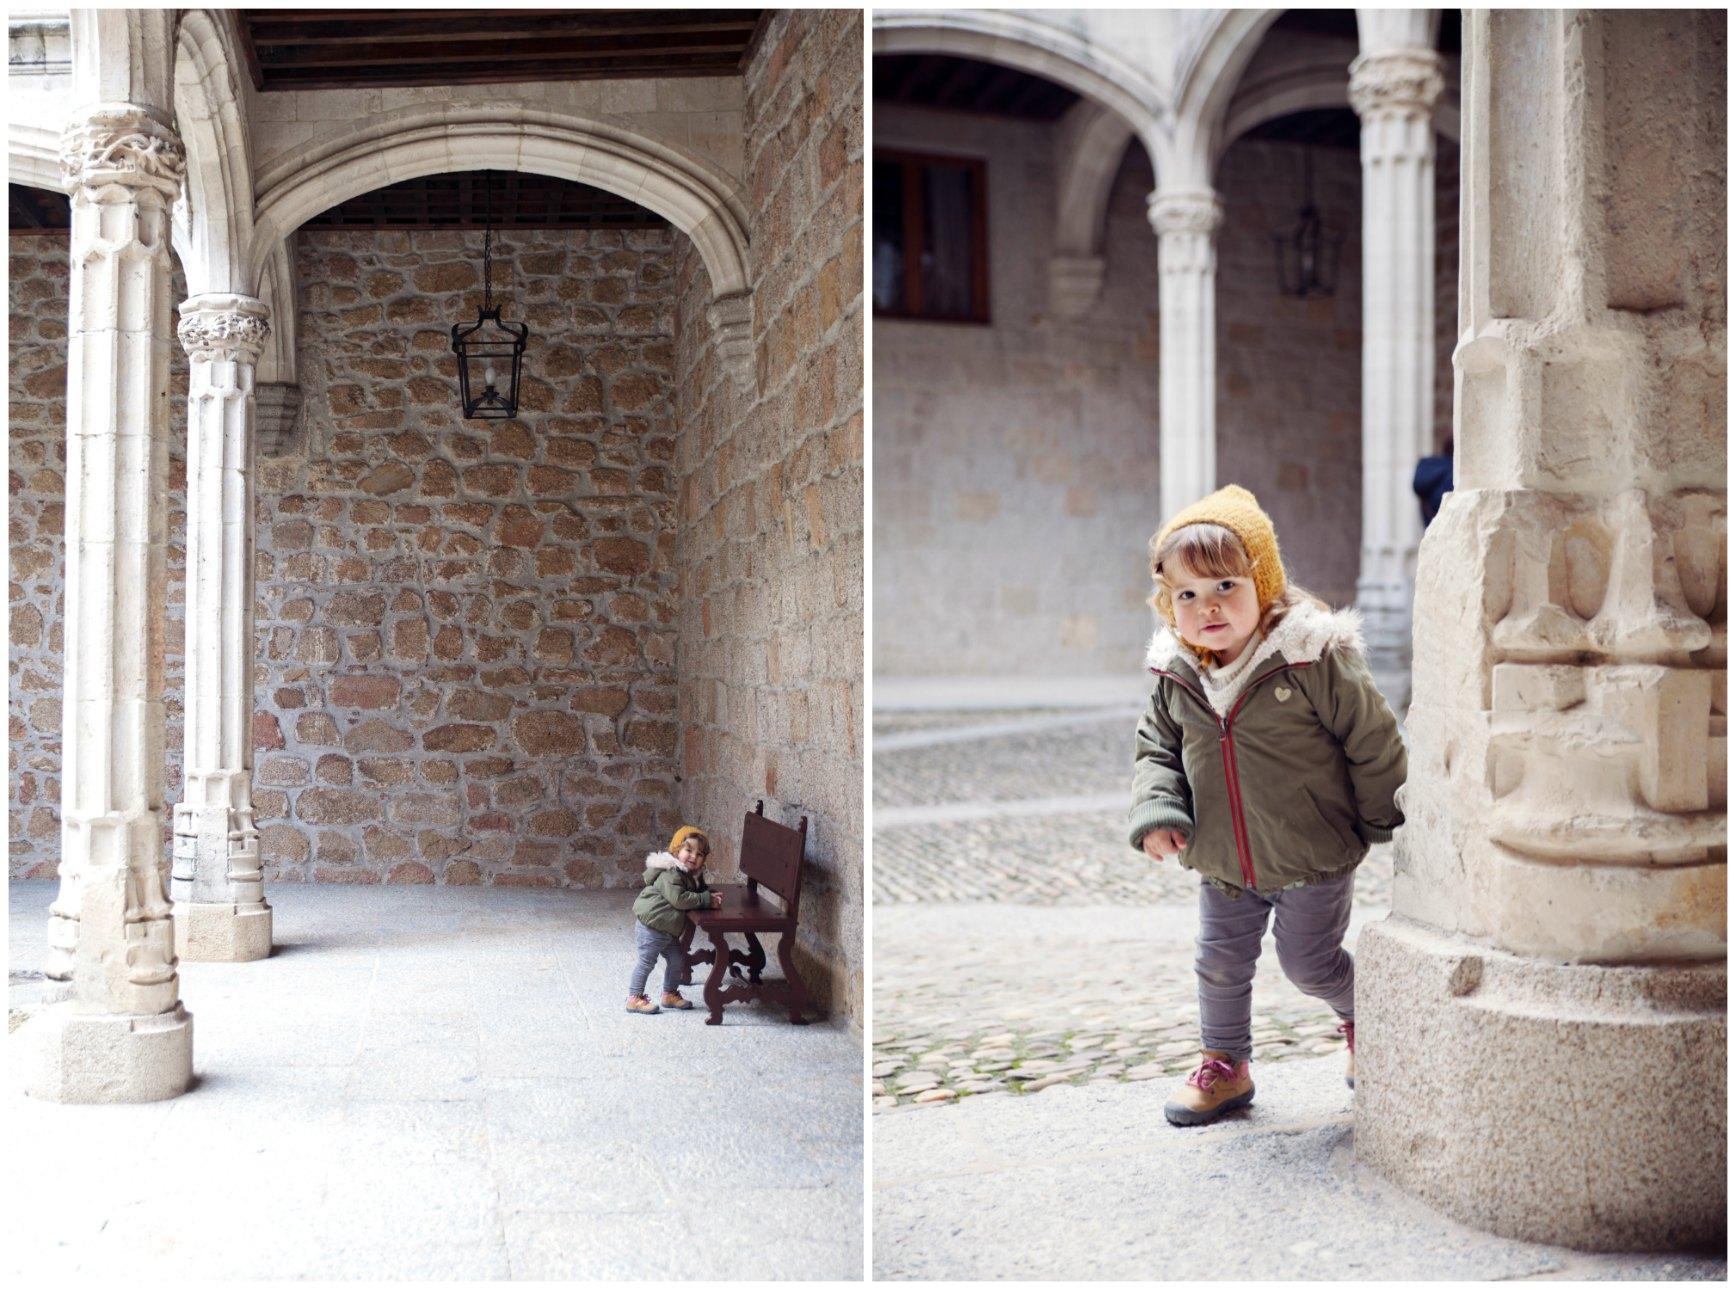 Castillo-Manzanares-El-Real-claraBmartin-11